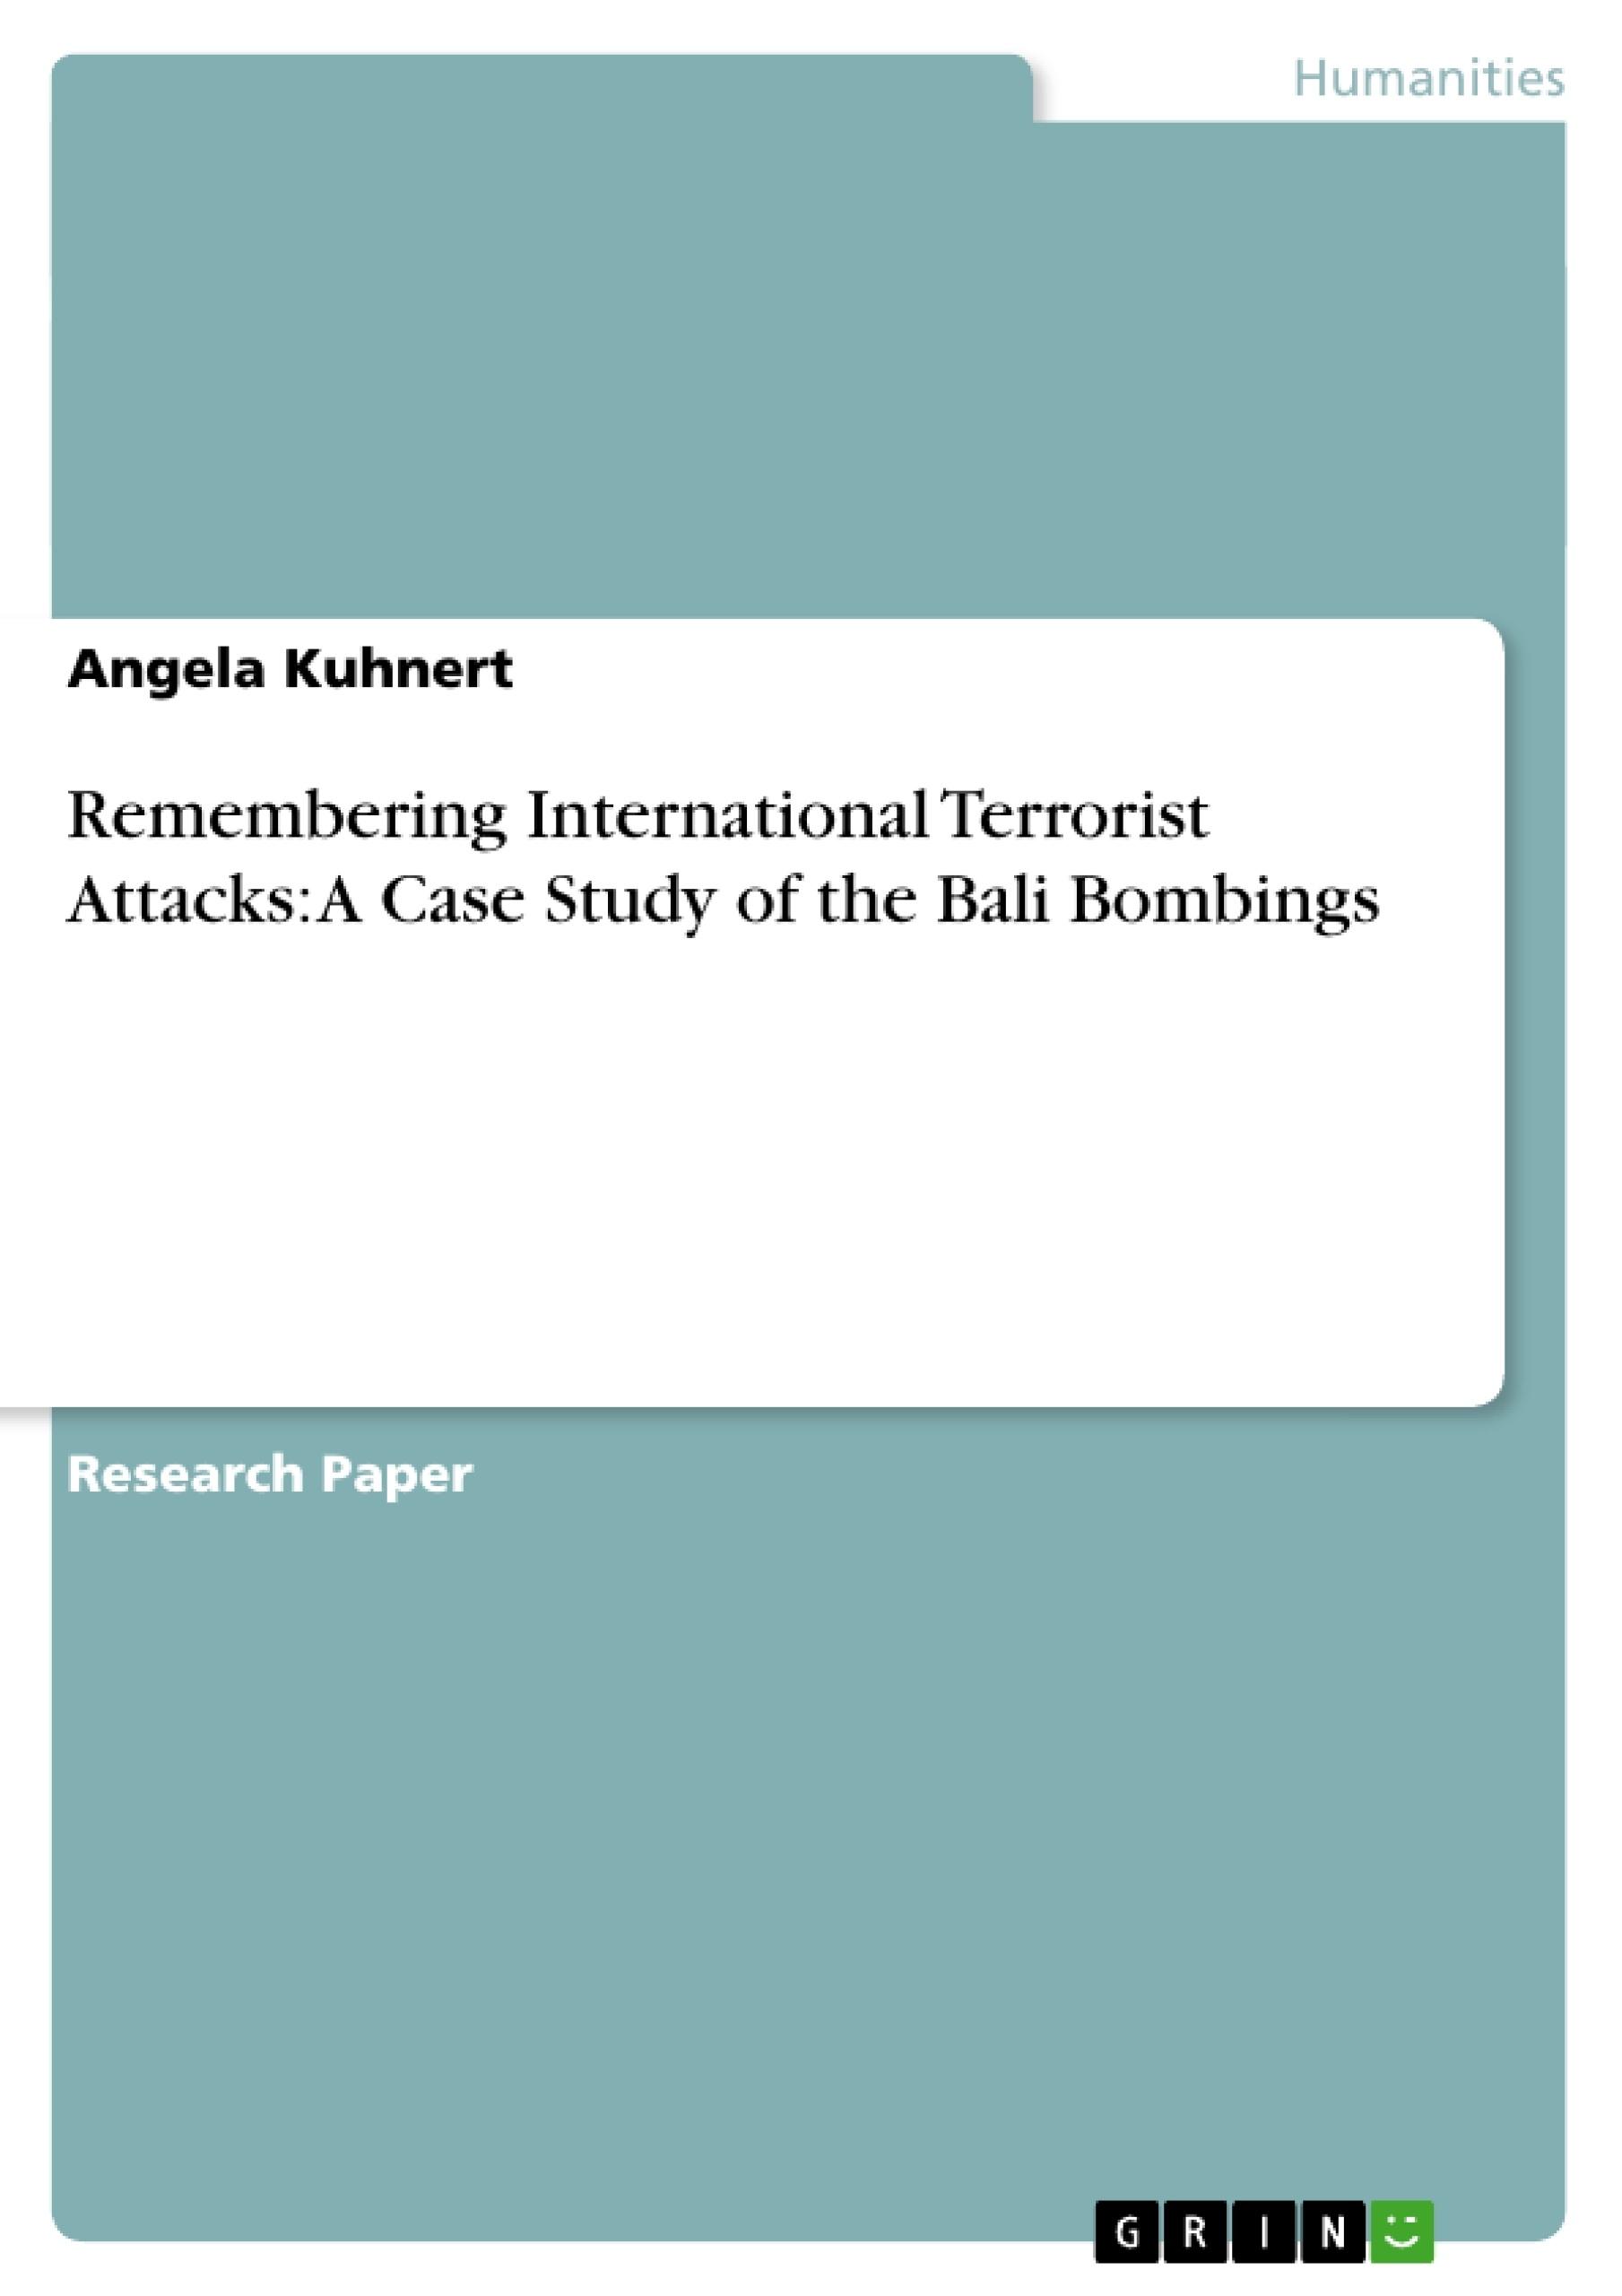 Title: Remembering International Terrorist Attacks: A Case Study of the Bali Bombings